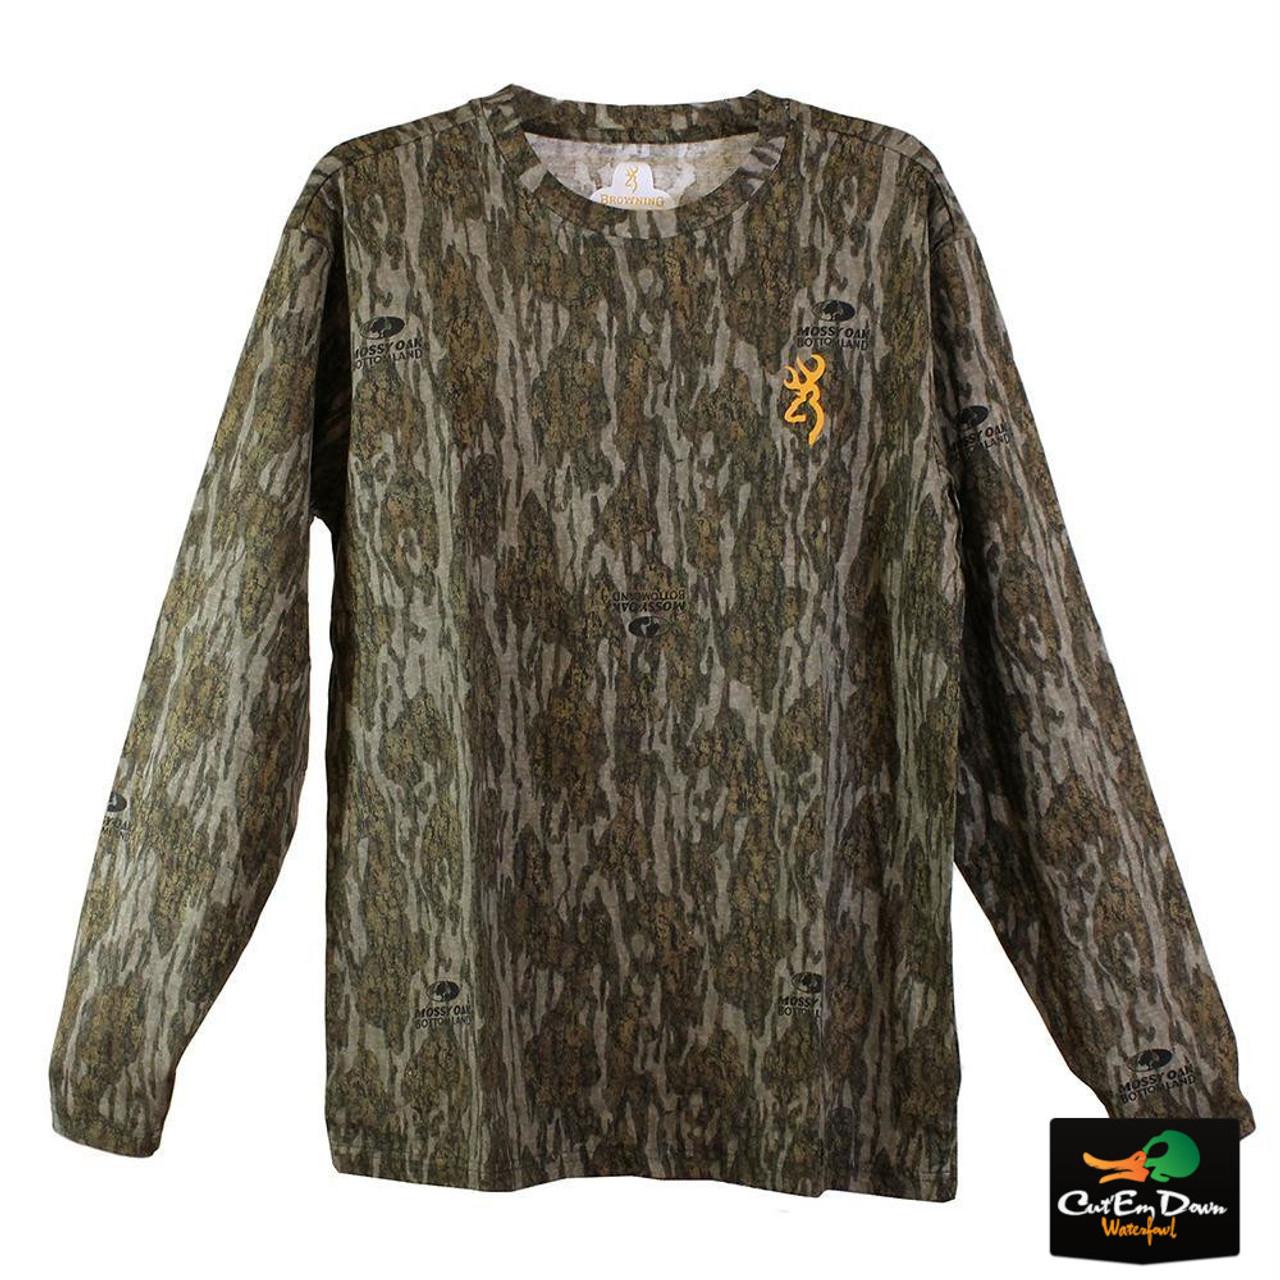 adafab727257b Browning Wasatch CB Long Sleeve T-Shirt - Mossy Oak Bottomland Camo